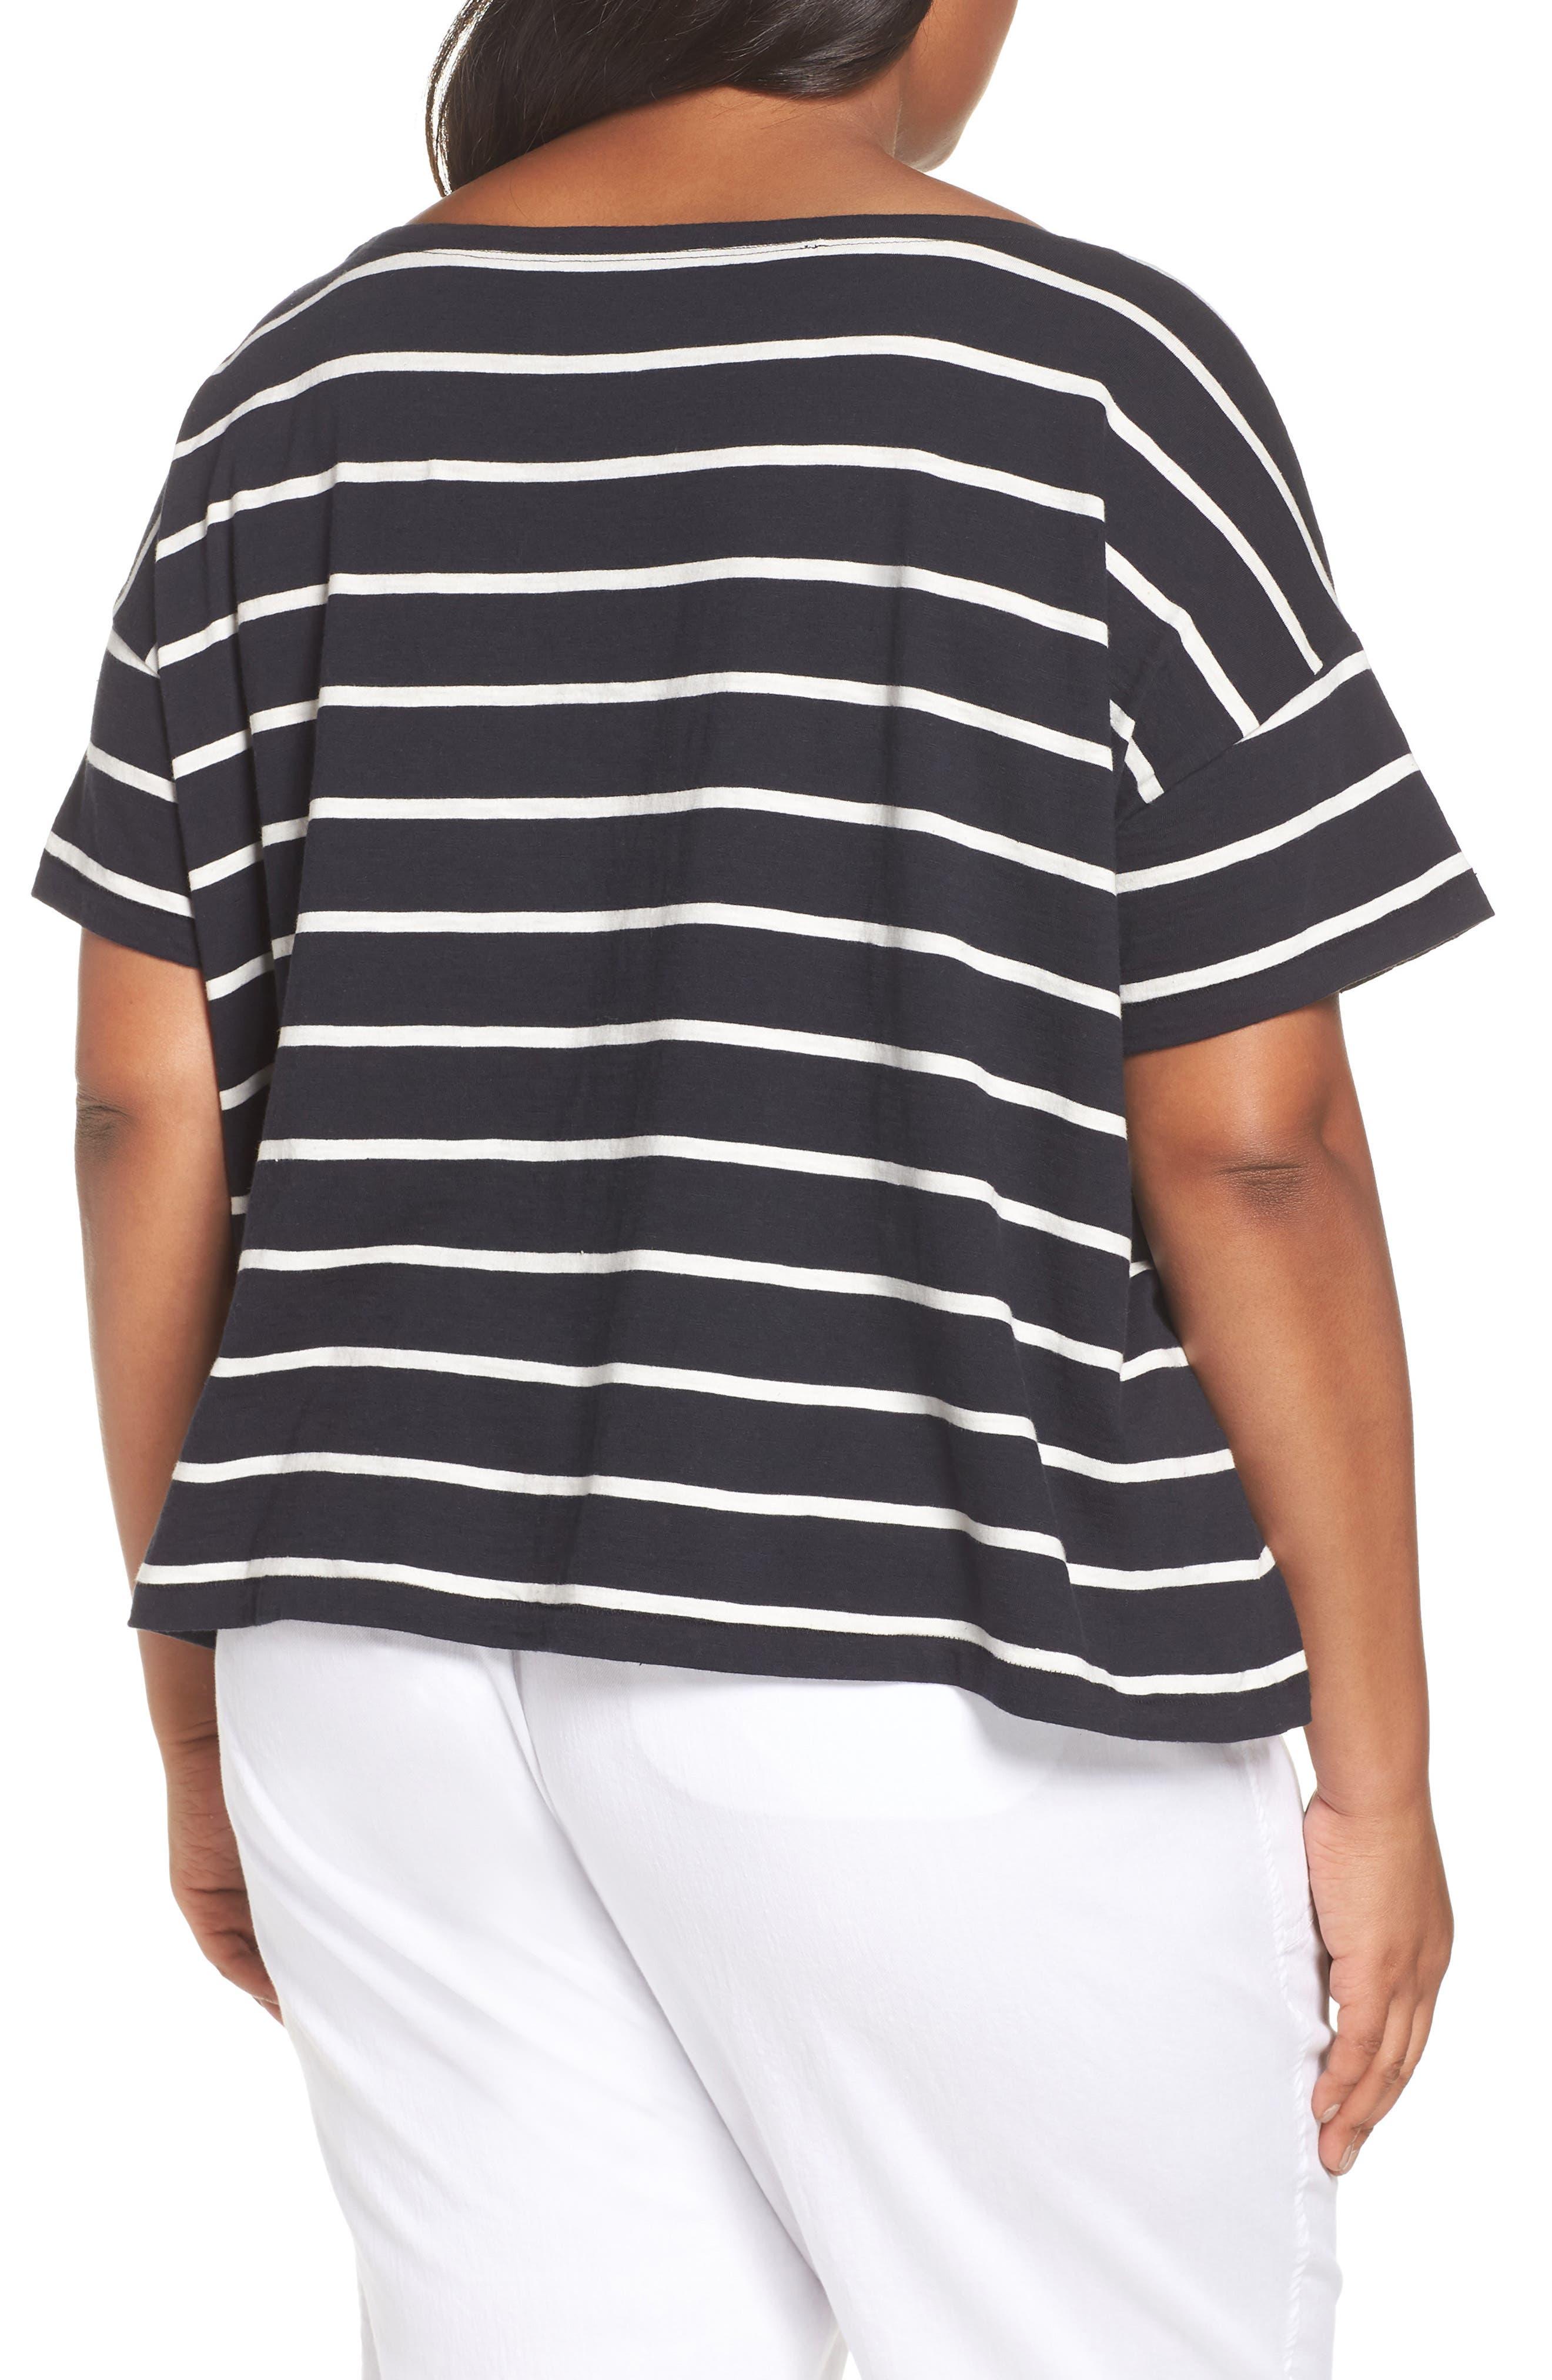 Stripe Organic Cotton Top,                             Alternate thumbnail 2, color,                             Black/ White